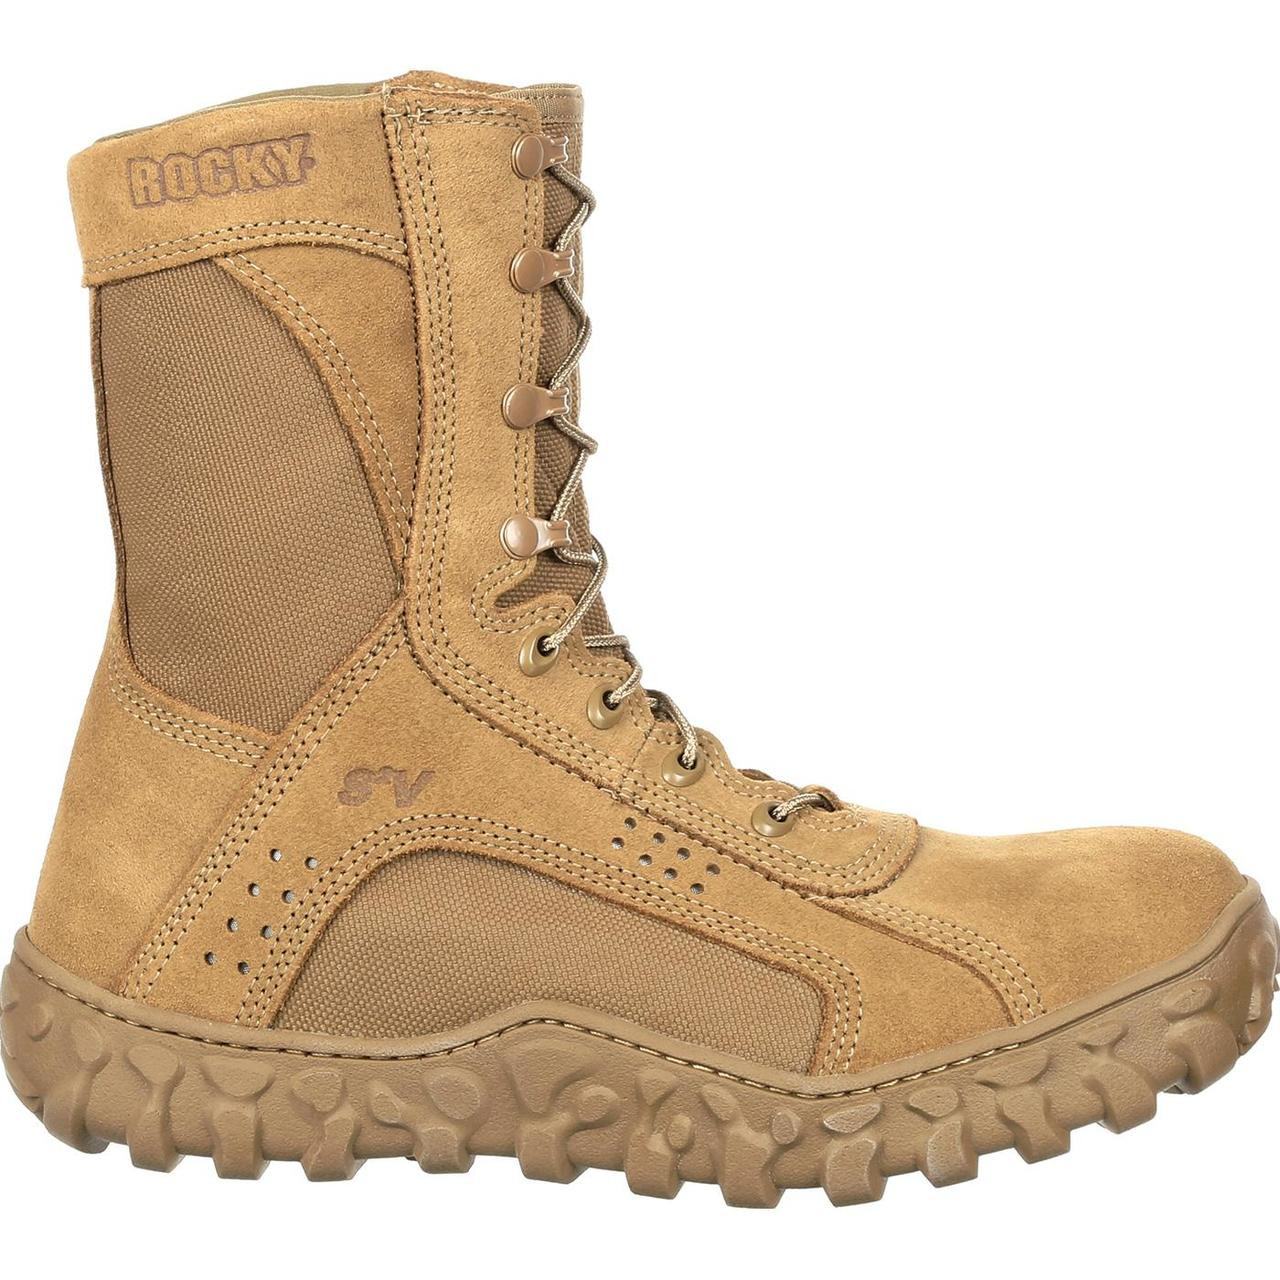 Buty Wojskowe Rocky S2v Composite Toe Coyote Brown Usa Made